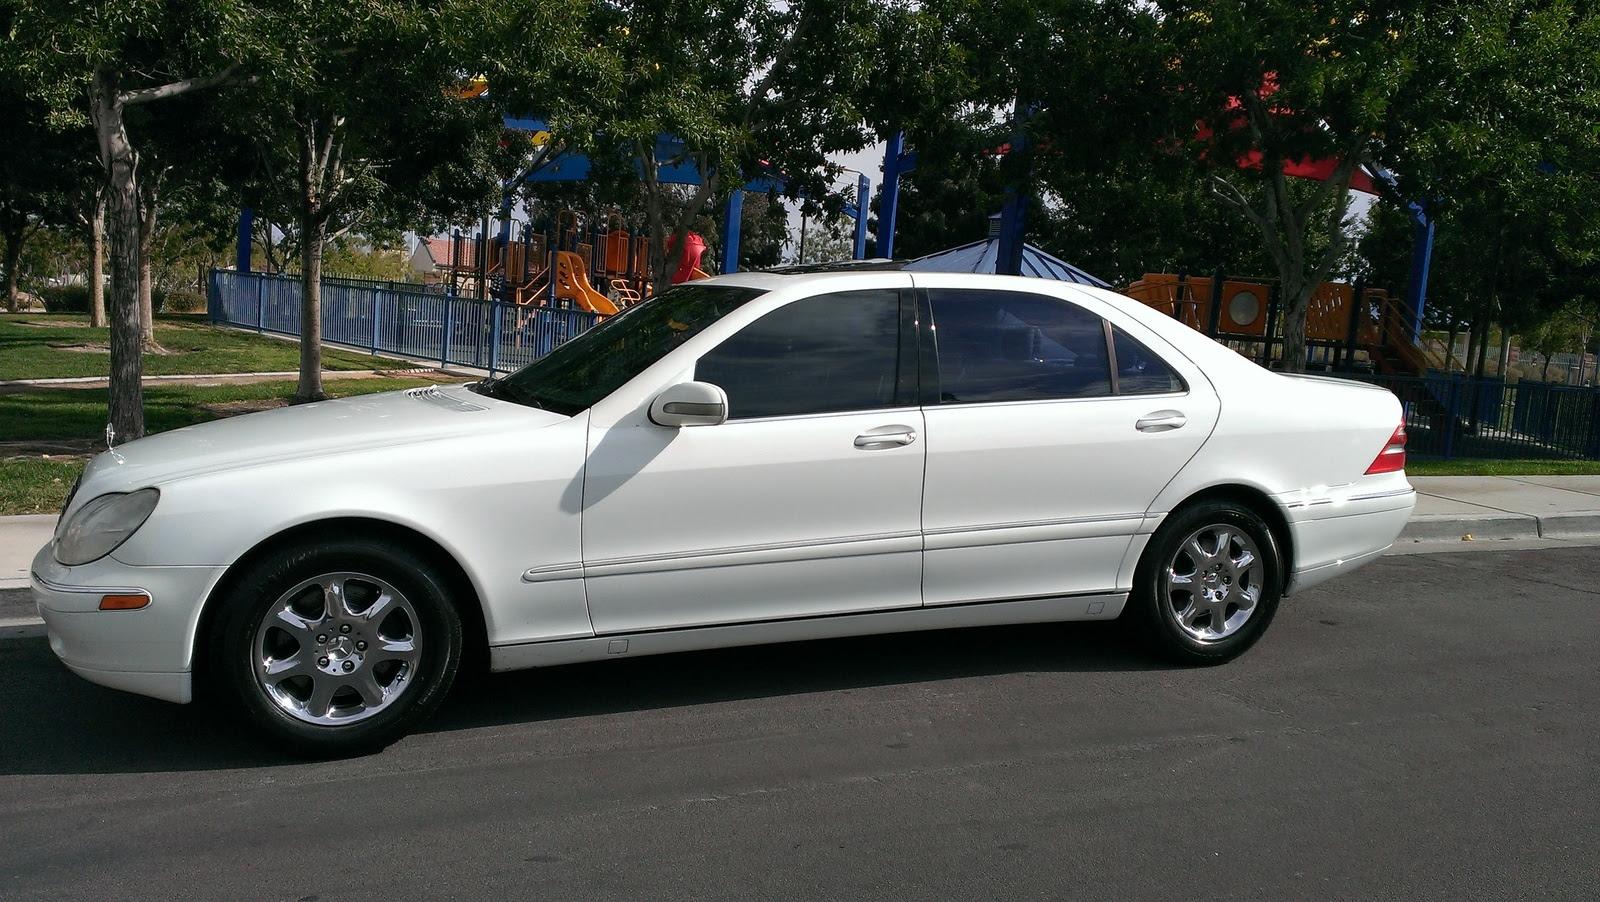 2000 Mercedes-Benz S-Class - Pictures - CarGurus